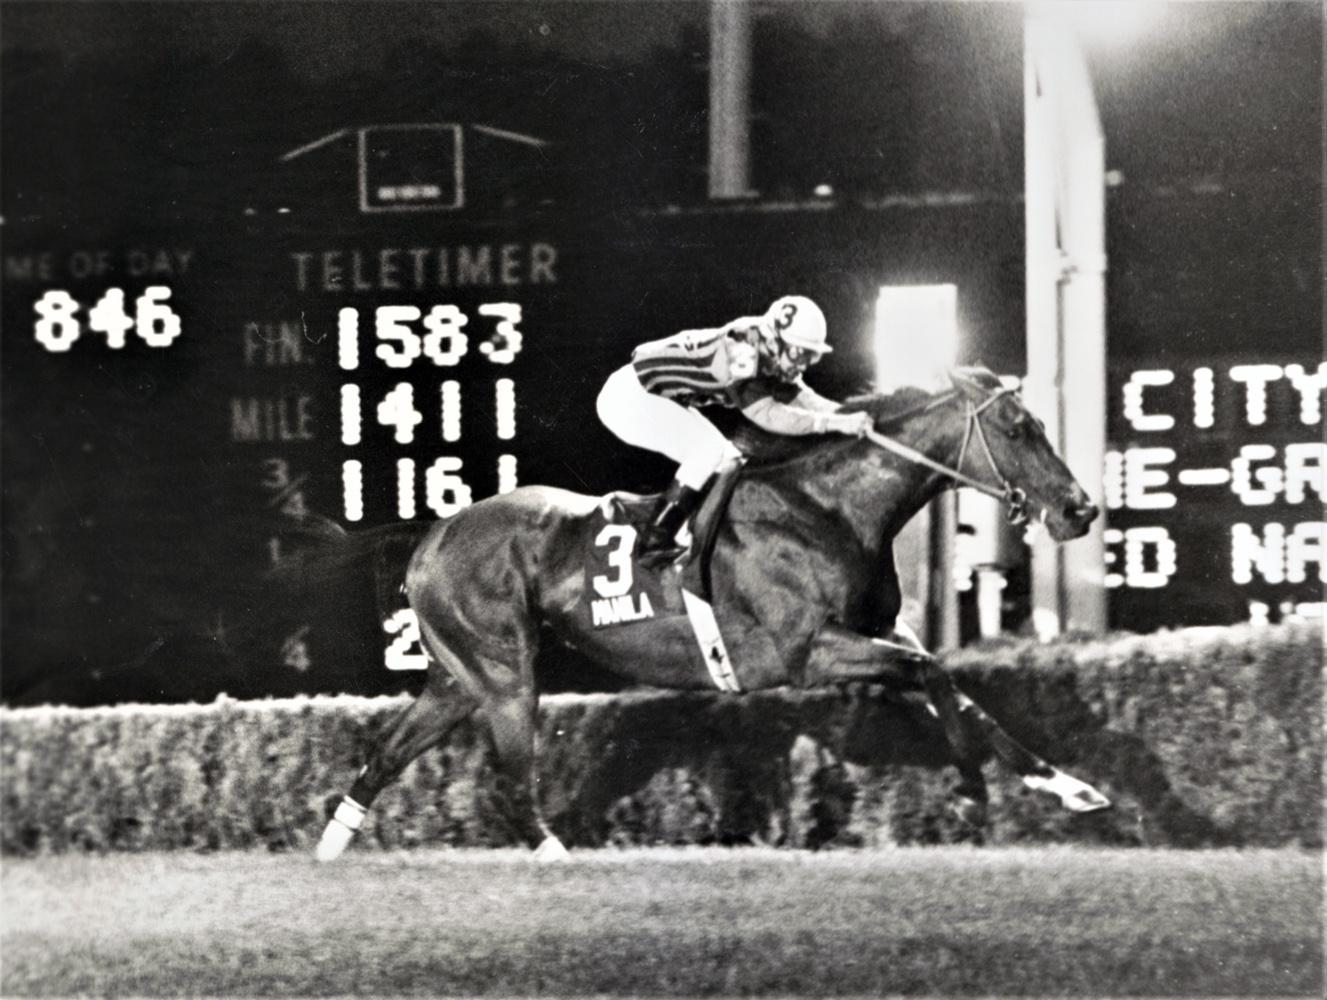 Manila (Jacinto Vasquez up) winning his second consecutve United Nations Handicap at Atlantic City Race Course, July 1987 (Jim Raftery Turfotos)